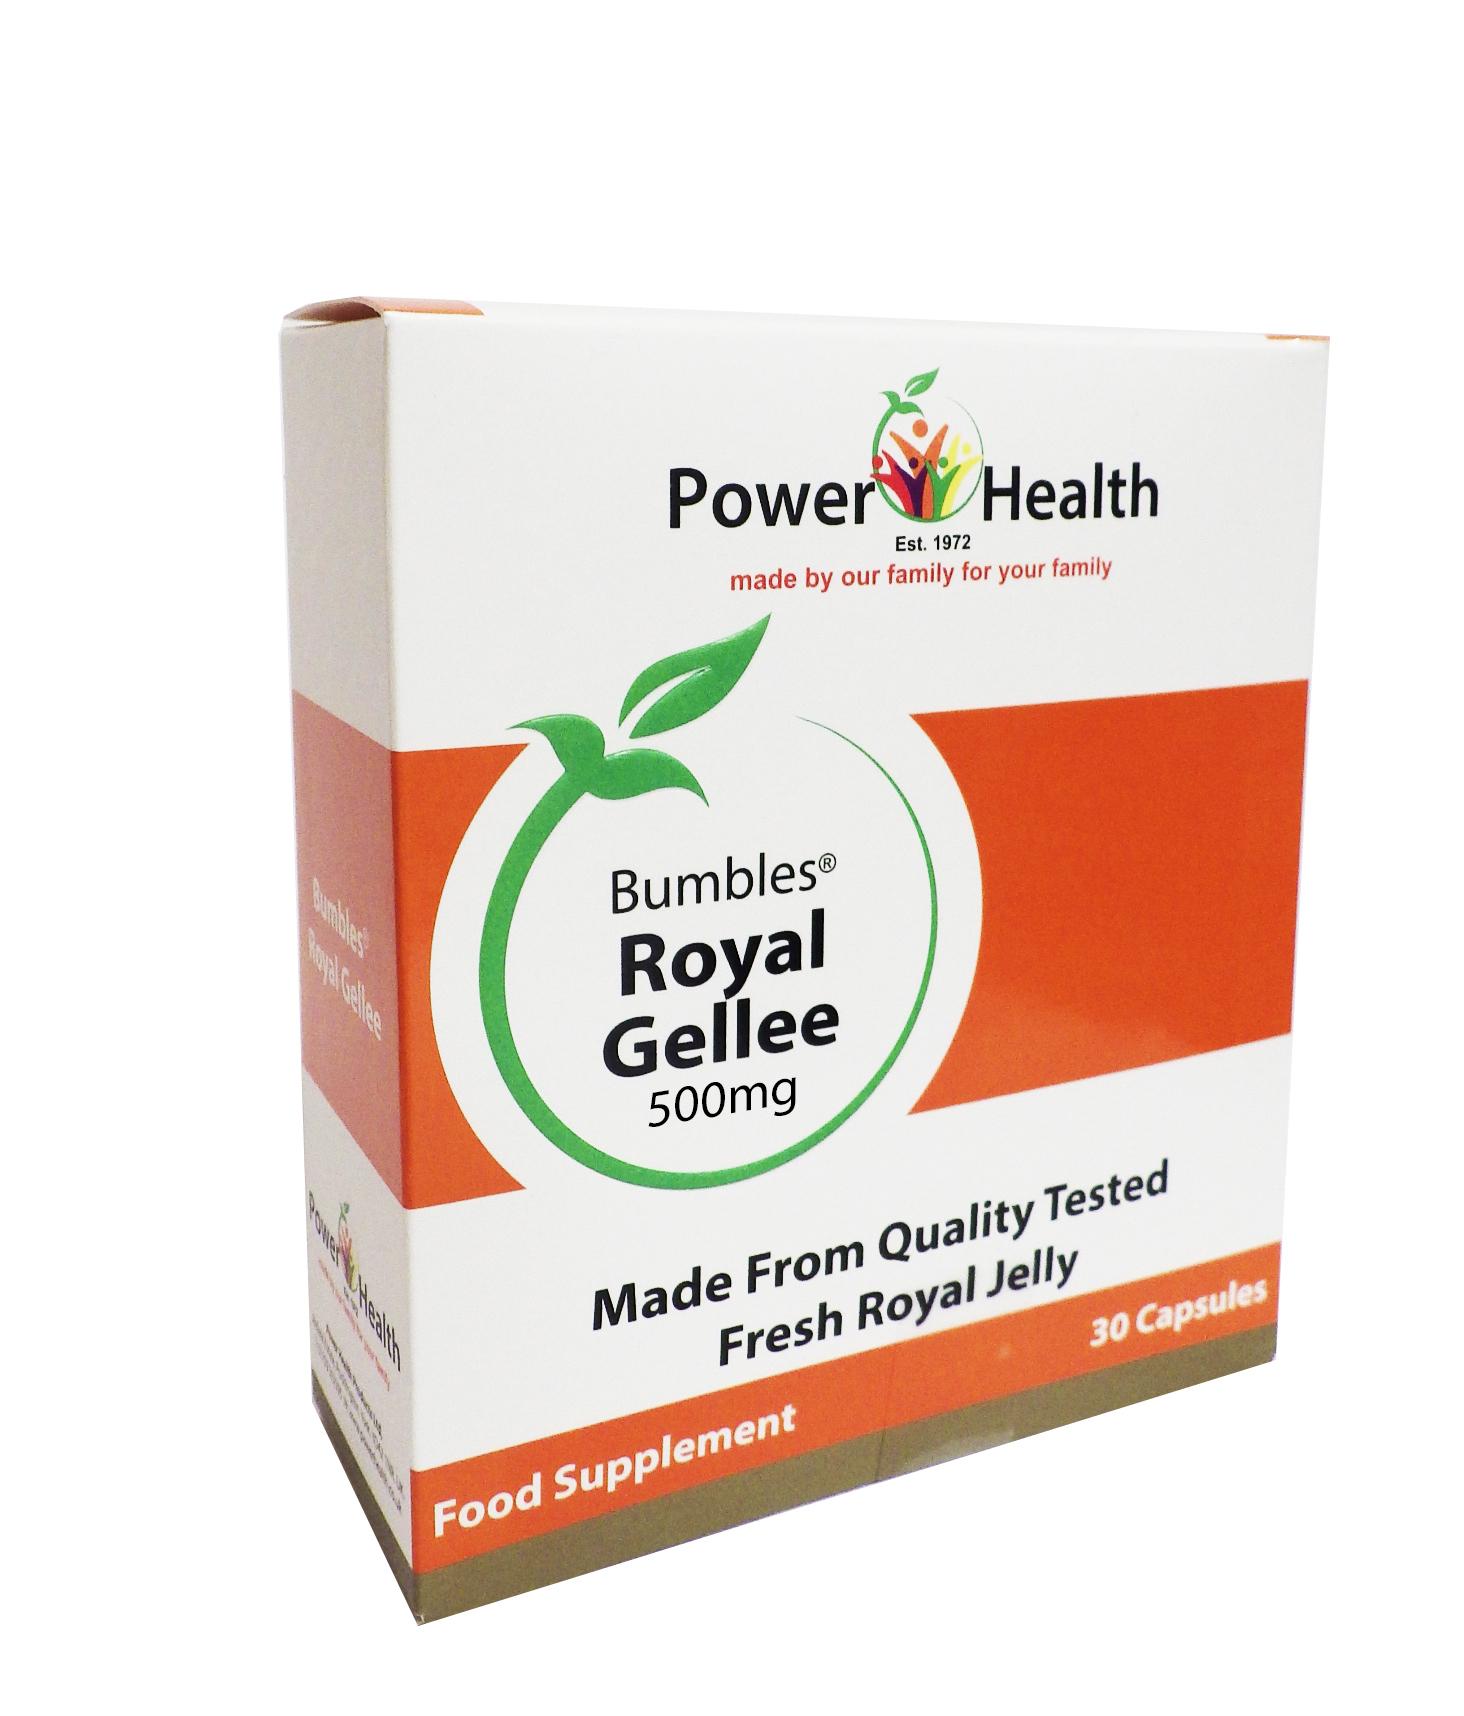 Bumbles Royal Gellee 500mg 30s